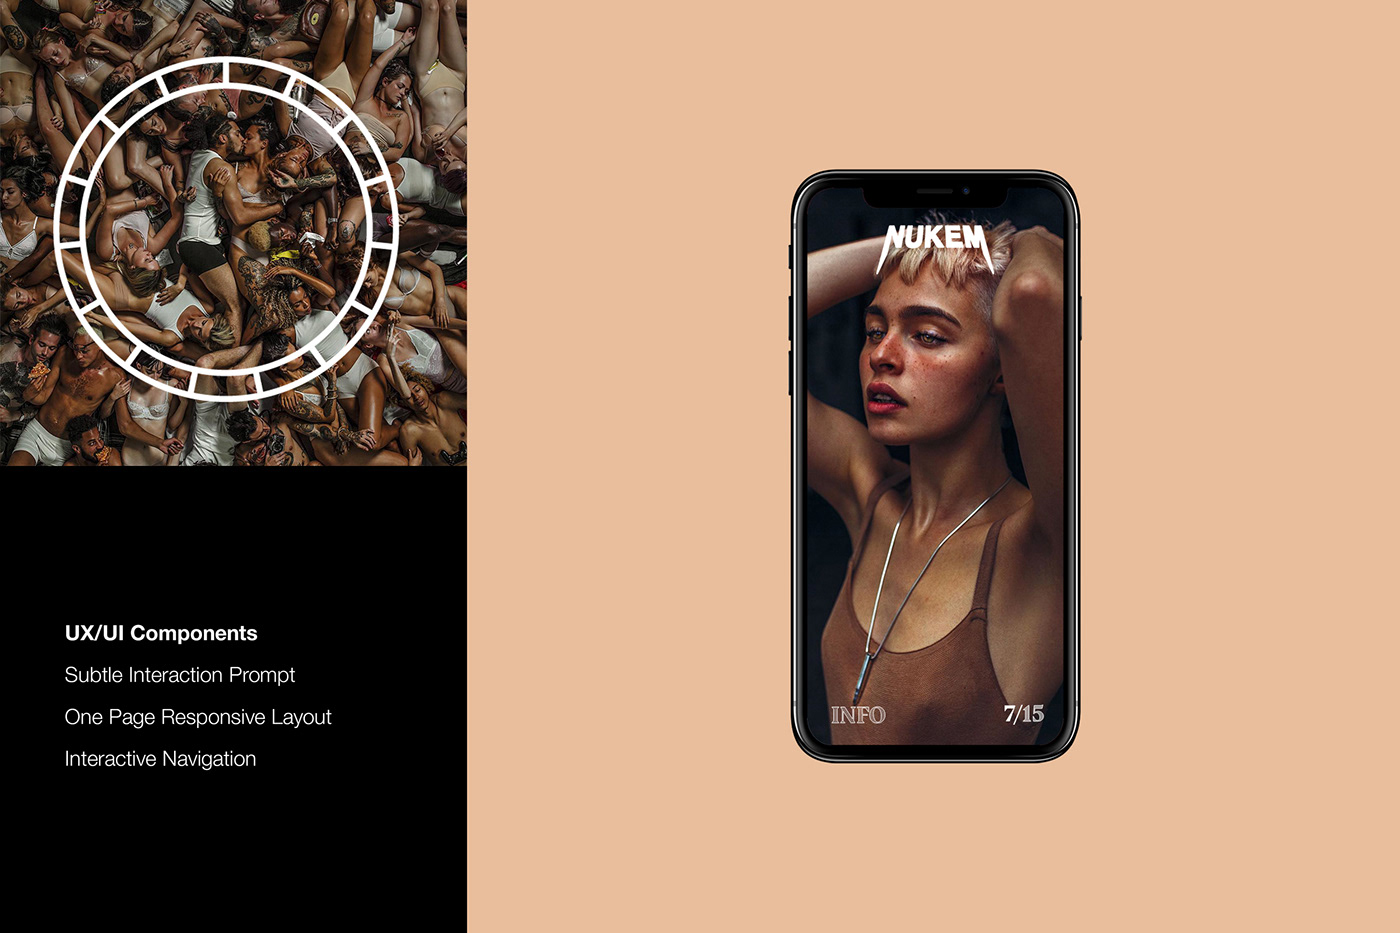 Photography  typography   modern clean simple edgy site design Haris Nukem art adobeawards